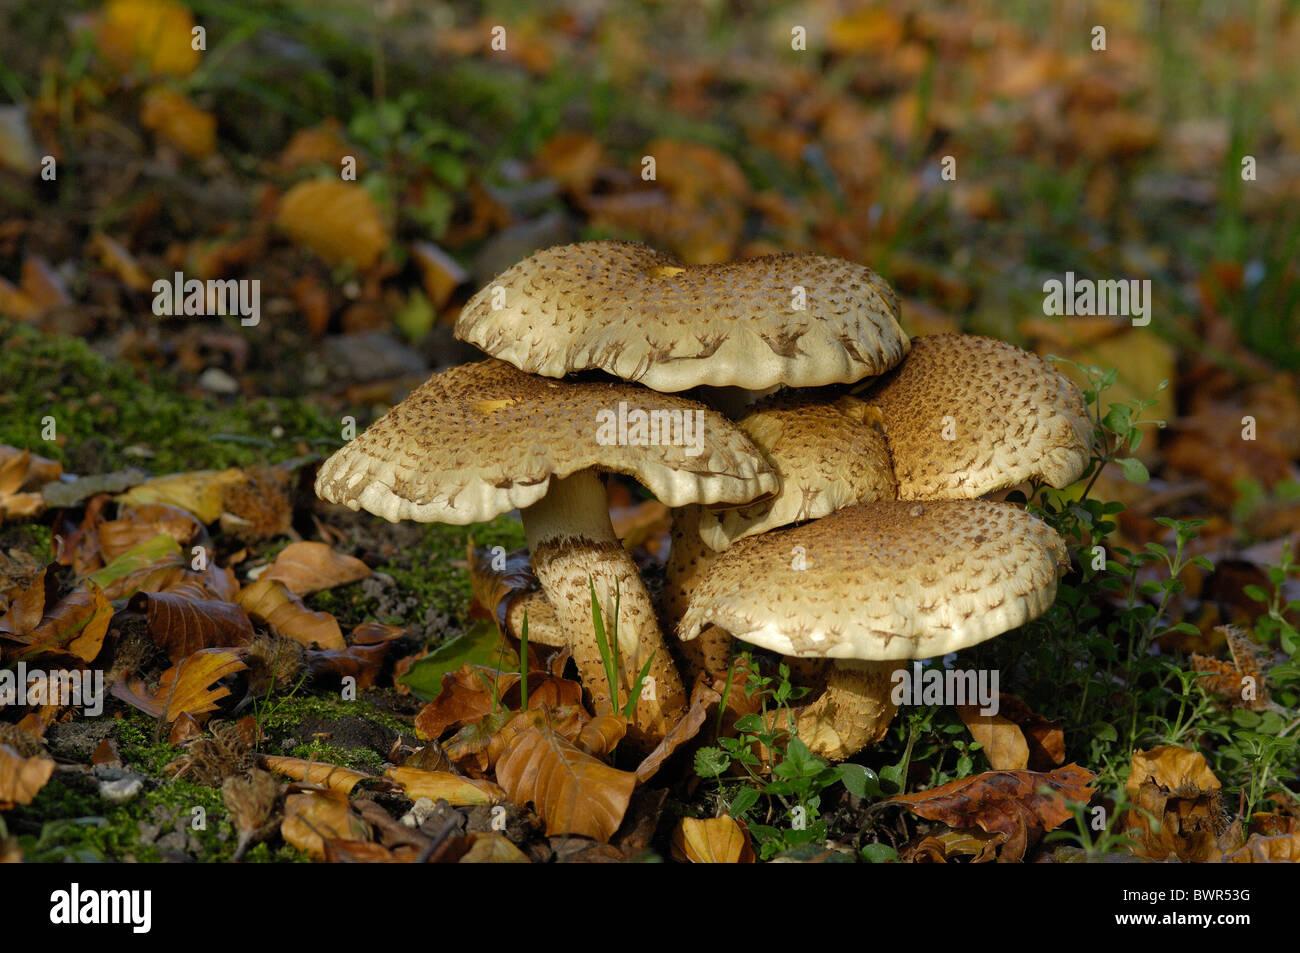 Shaggy scalycap - Shaggy Pholiota - Scaly Pholiota (Pholiota squarrosa) in autumn - Belgium - Stock Image